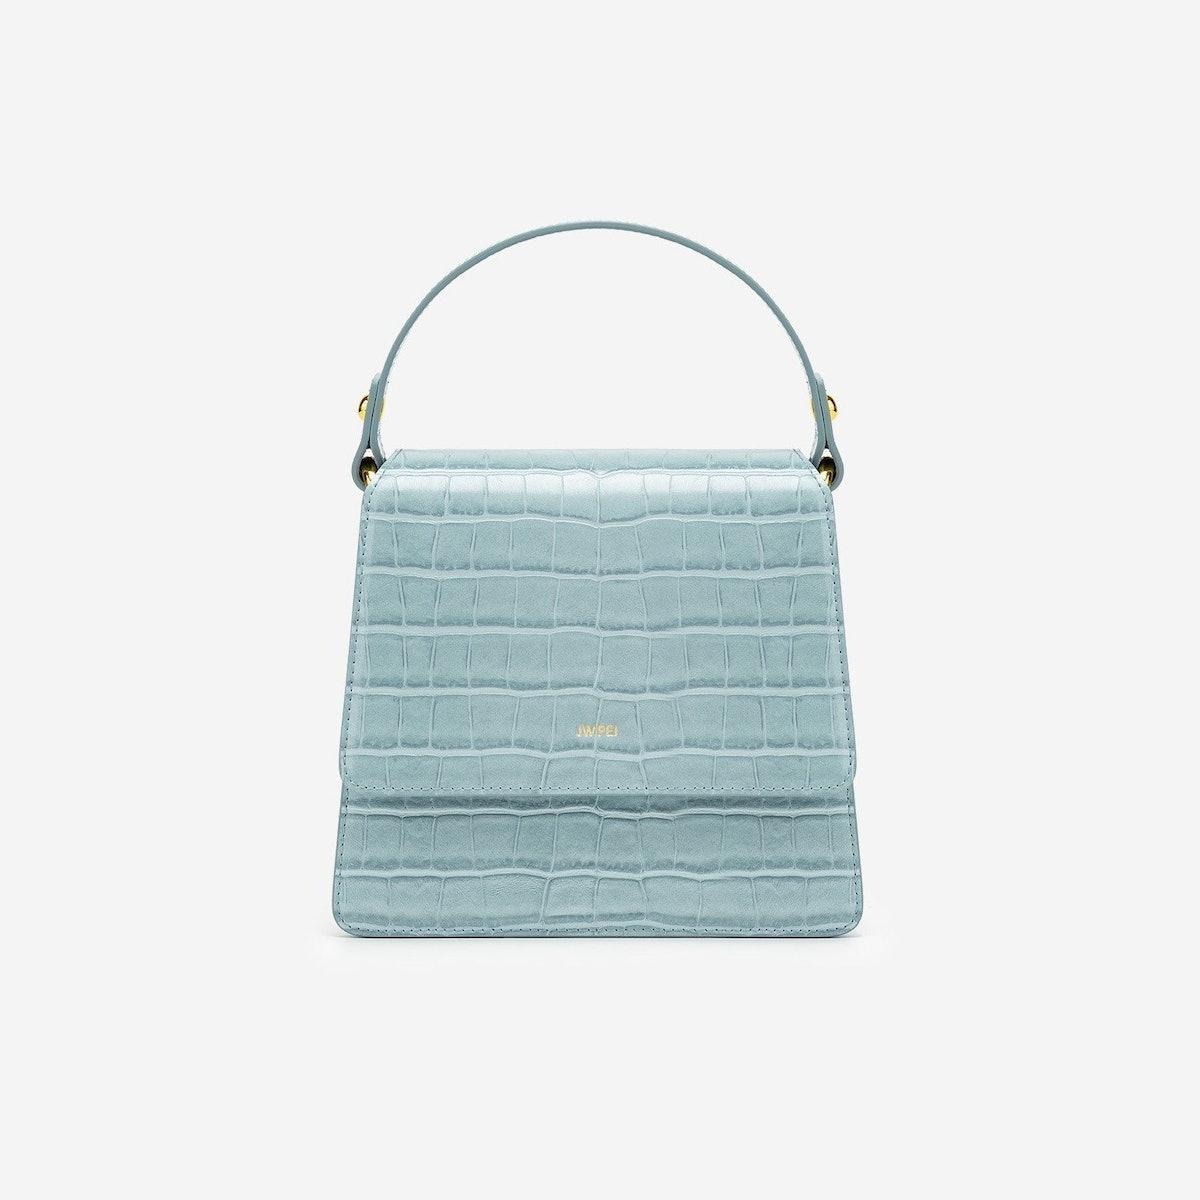 JW PEI The Fae Top Handle Bag